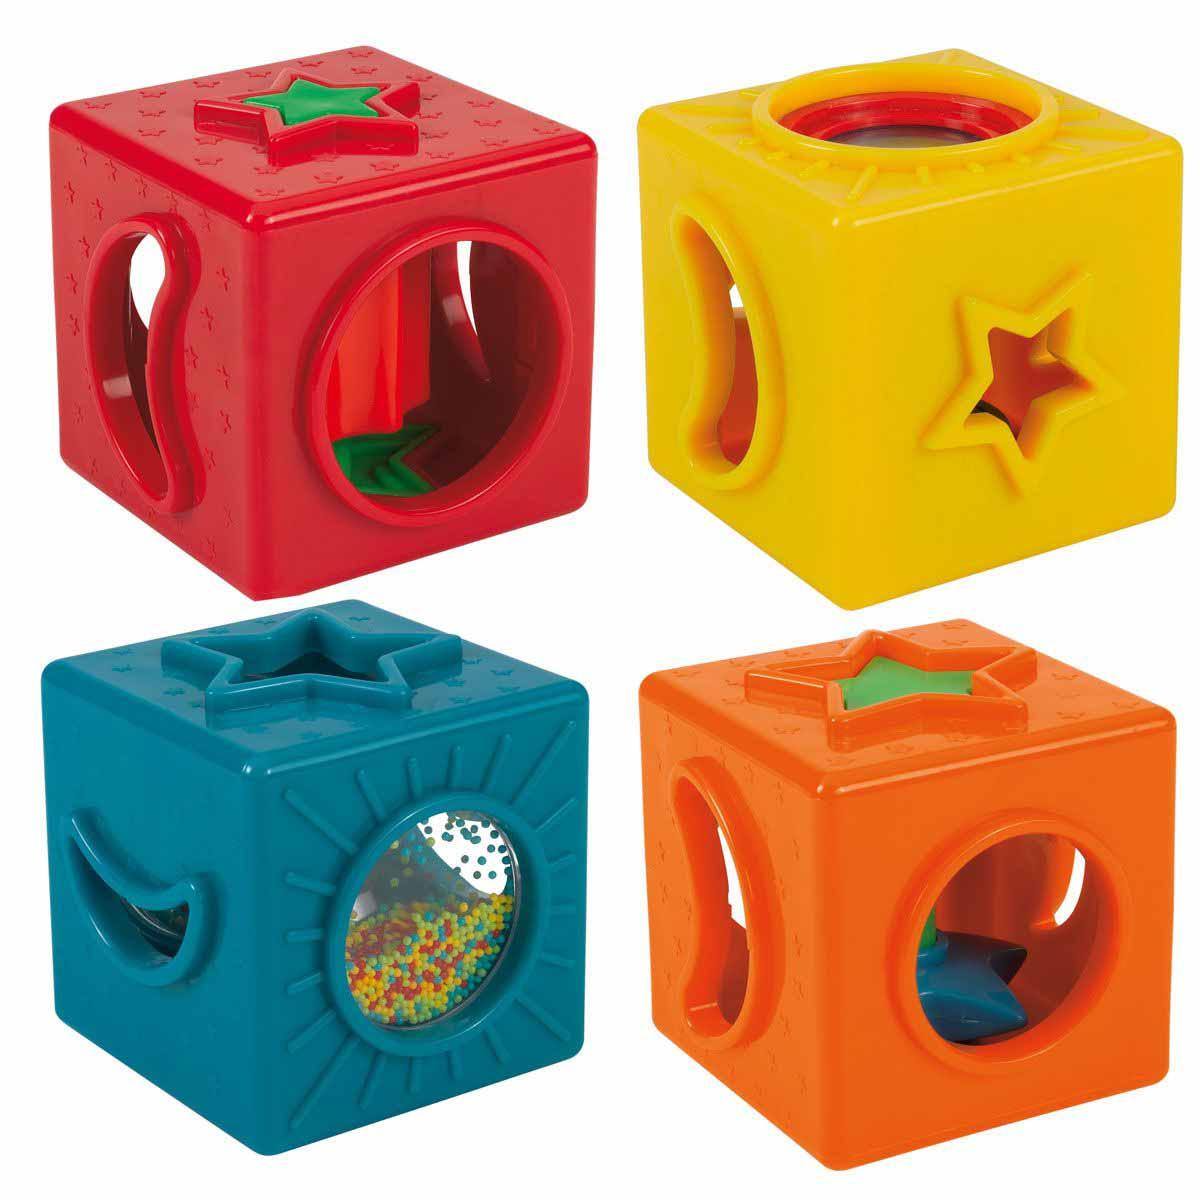 Развивающие кубикиРазвивающие игрушки Simba Baby<br>Развивающие кубики<br>